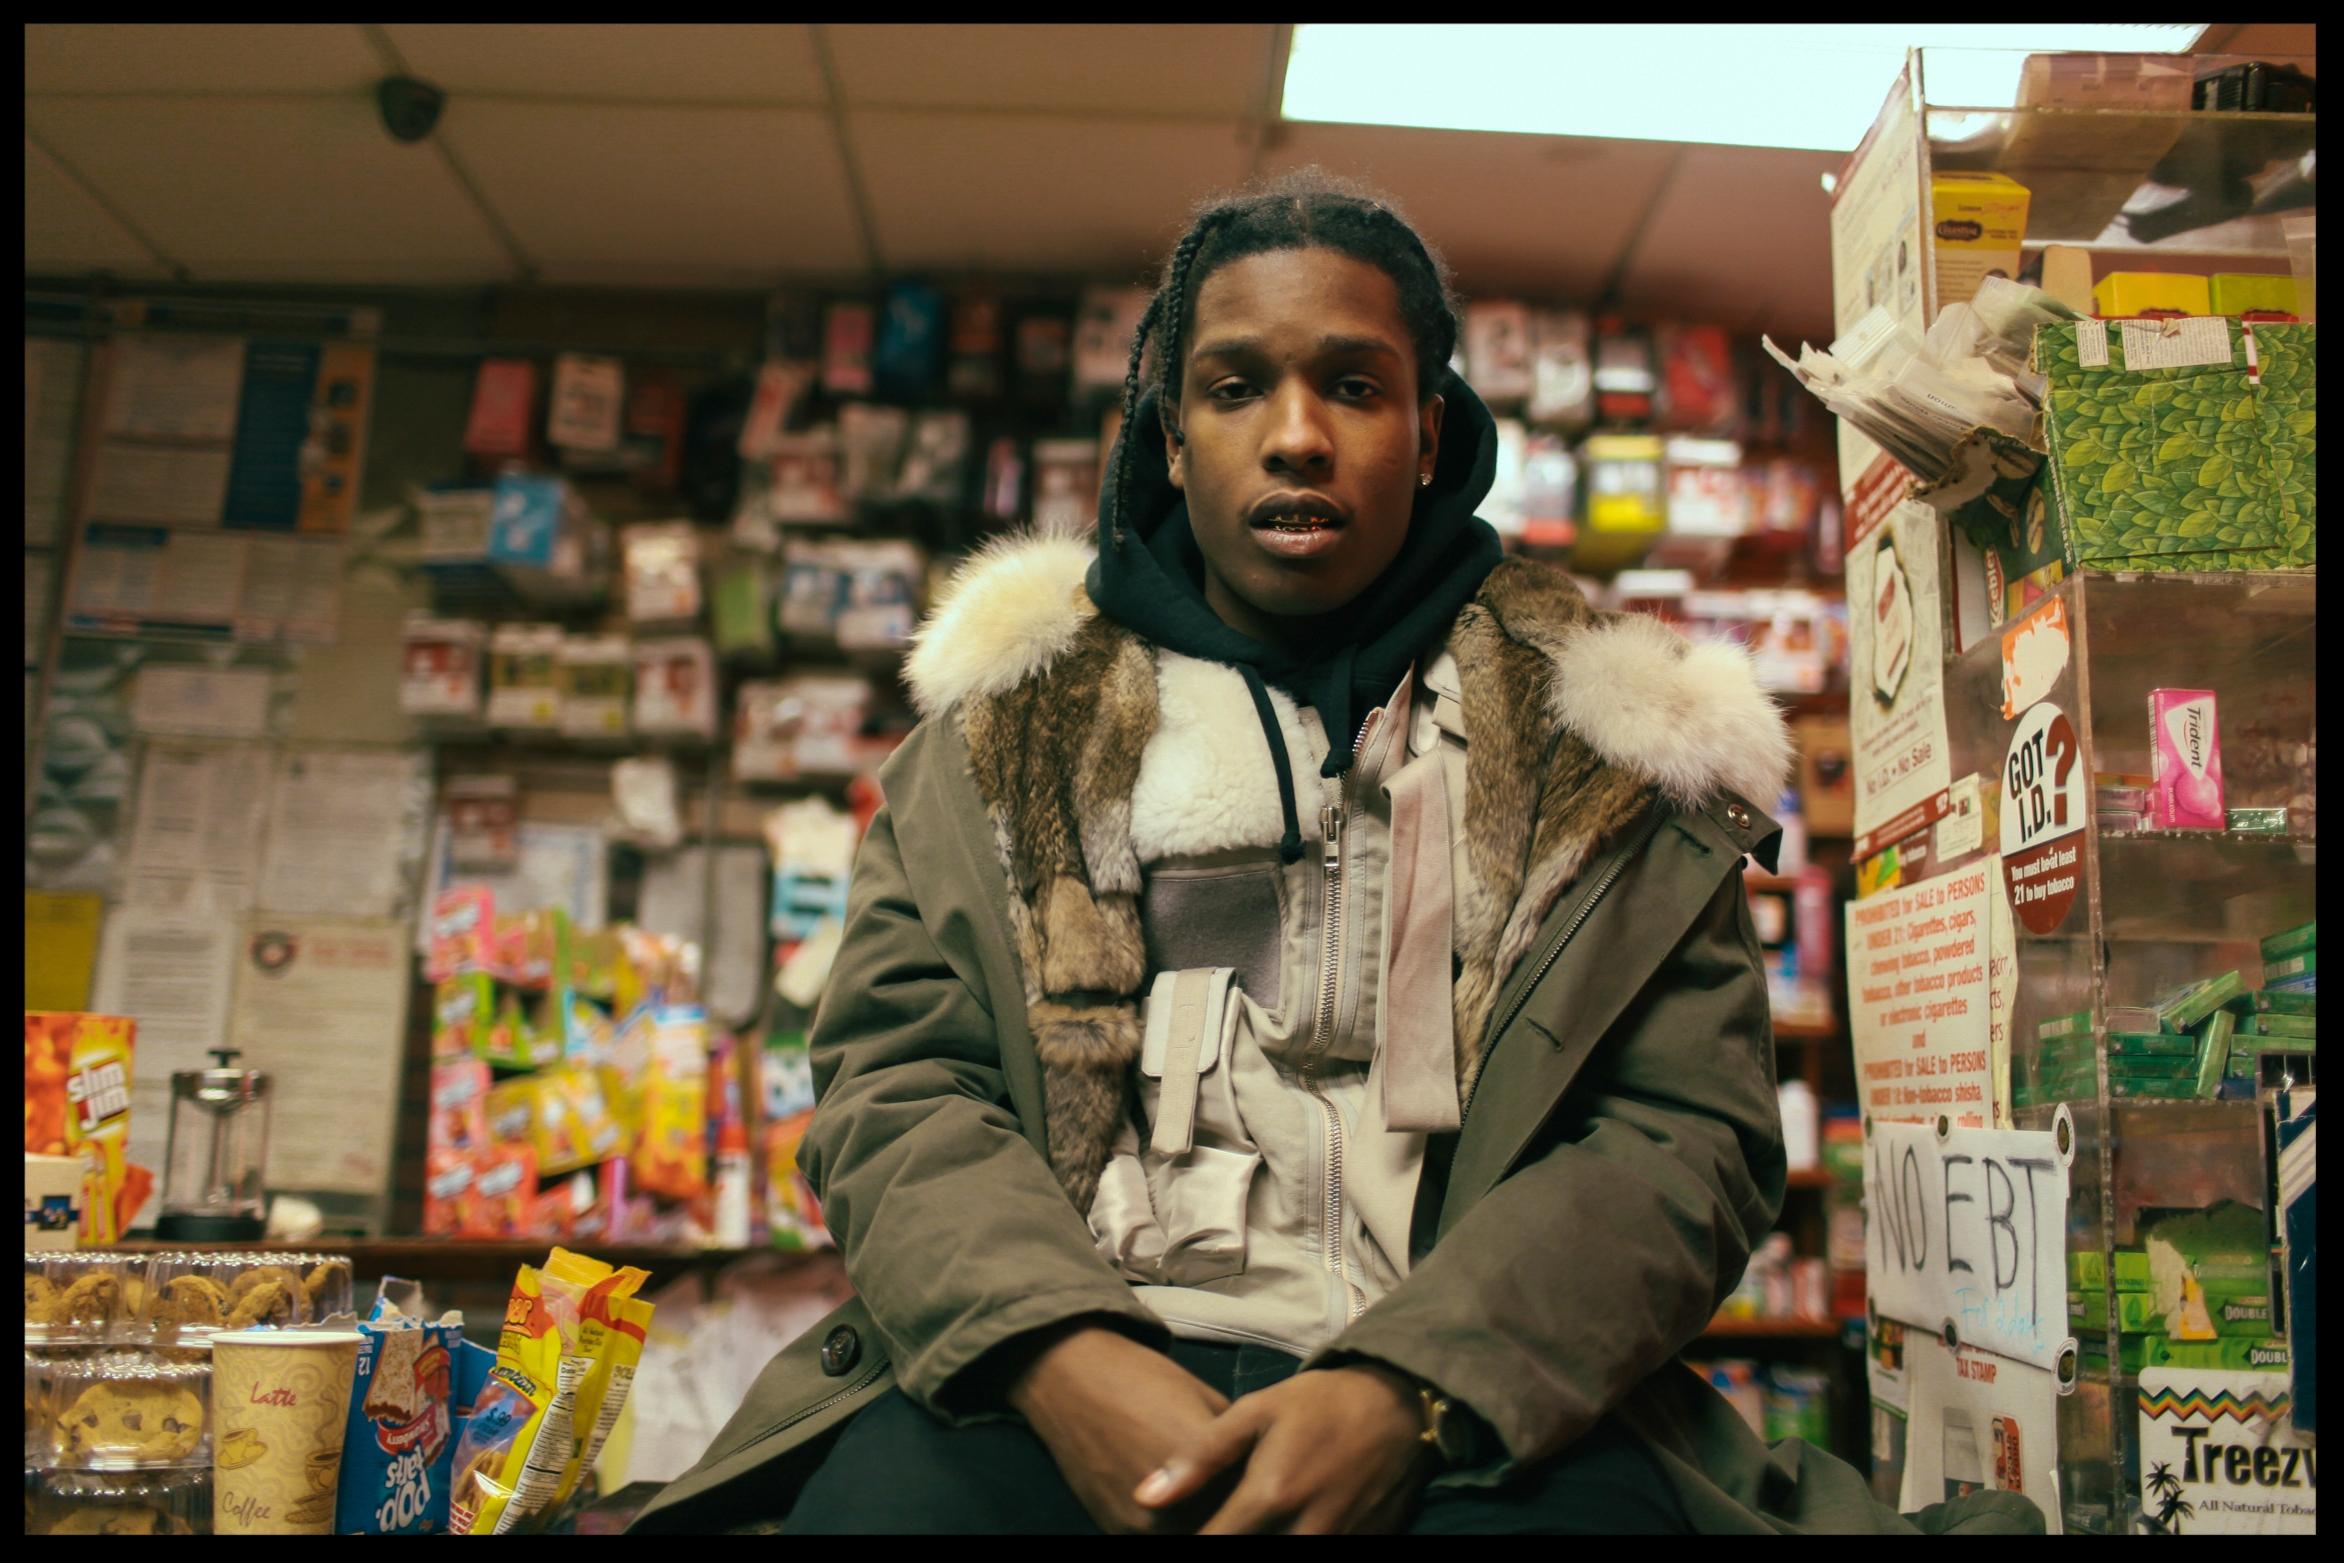 A$ap Rocky Harlem 2015